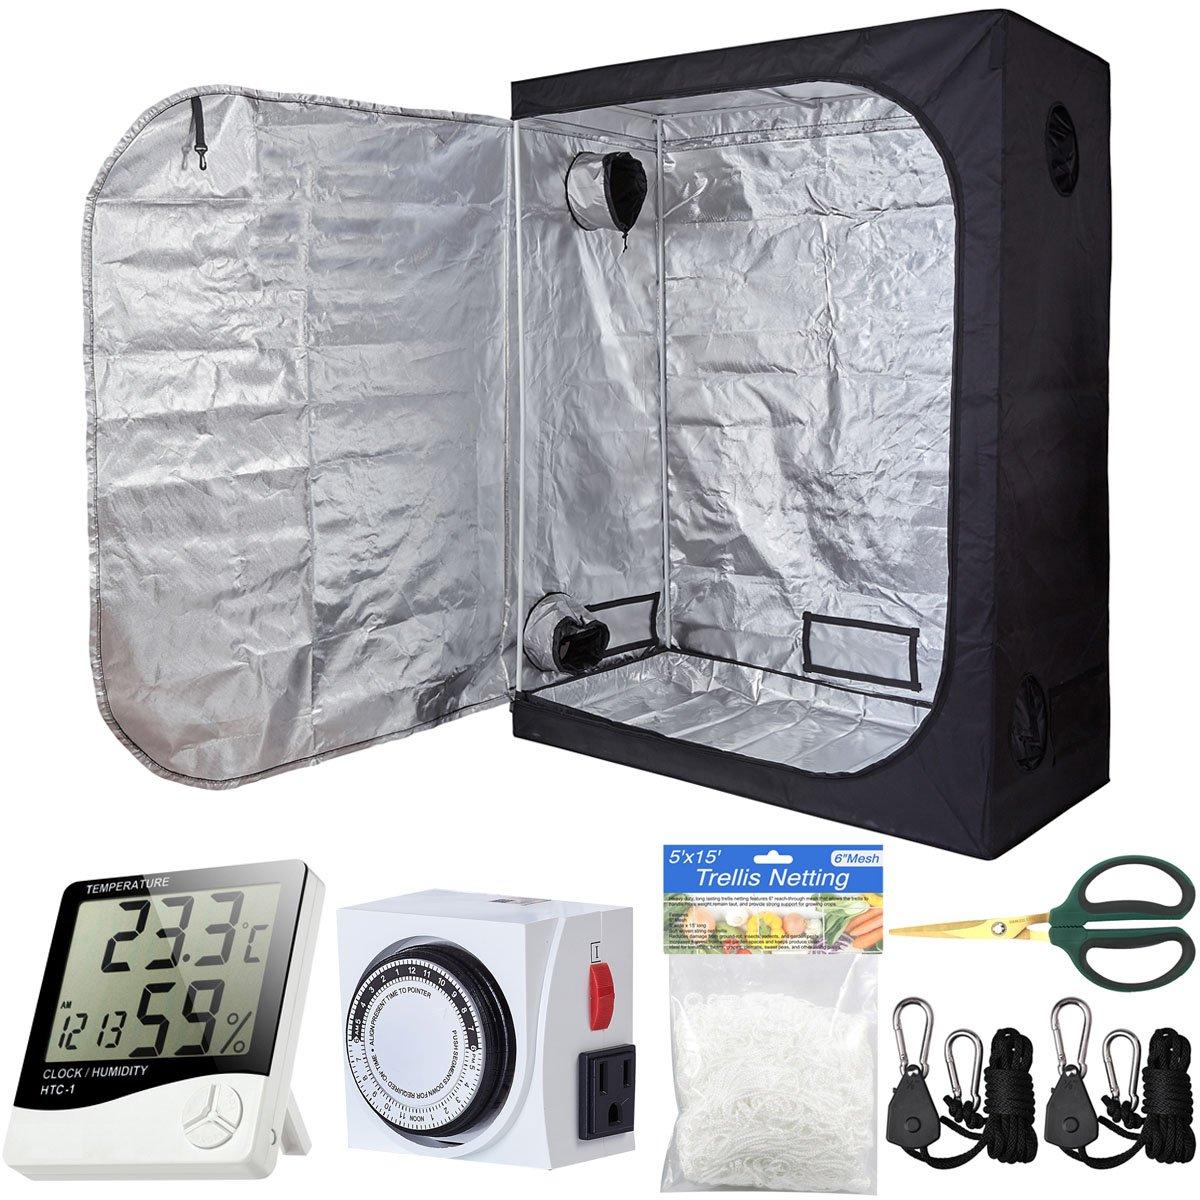 PrimeGarden 60''x32''x80'' Grow Tent Kit Indoor Plant Grow Tent Room + 24 Hour Timer + 60mm Bonsai Straight Scissors + Digital Hygrometer Thermometer + Trellis Nets +1 Pair of Rope Hangers